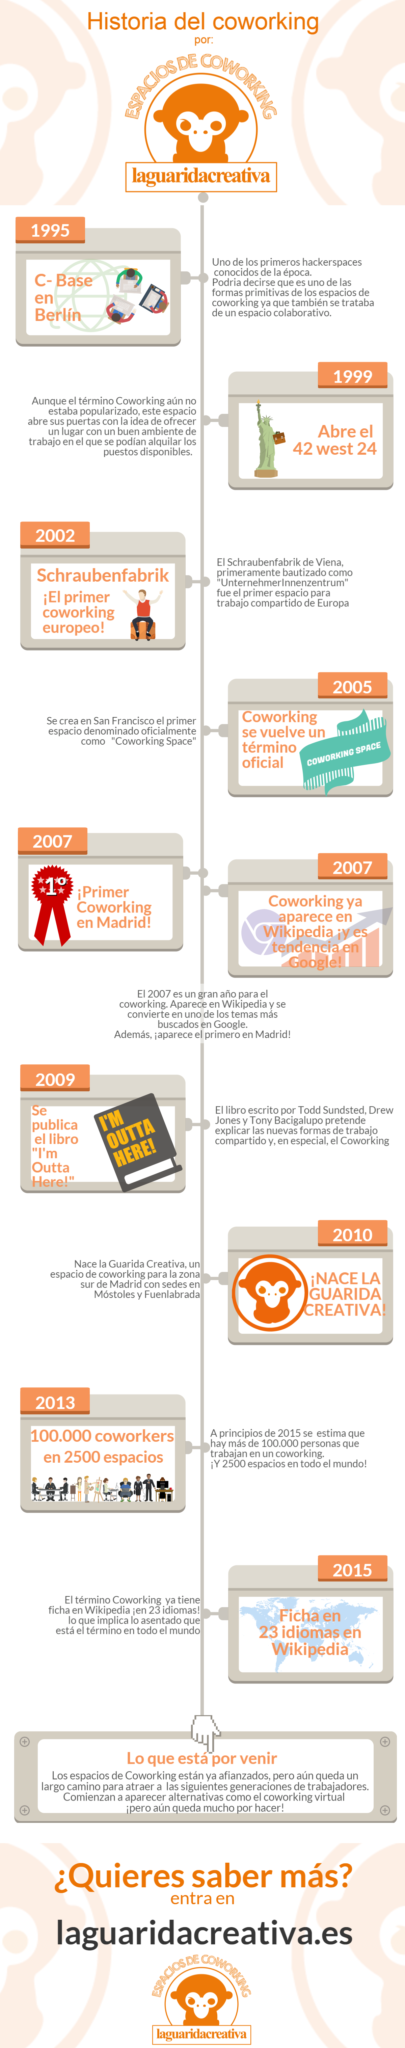 Historia del Coworking